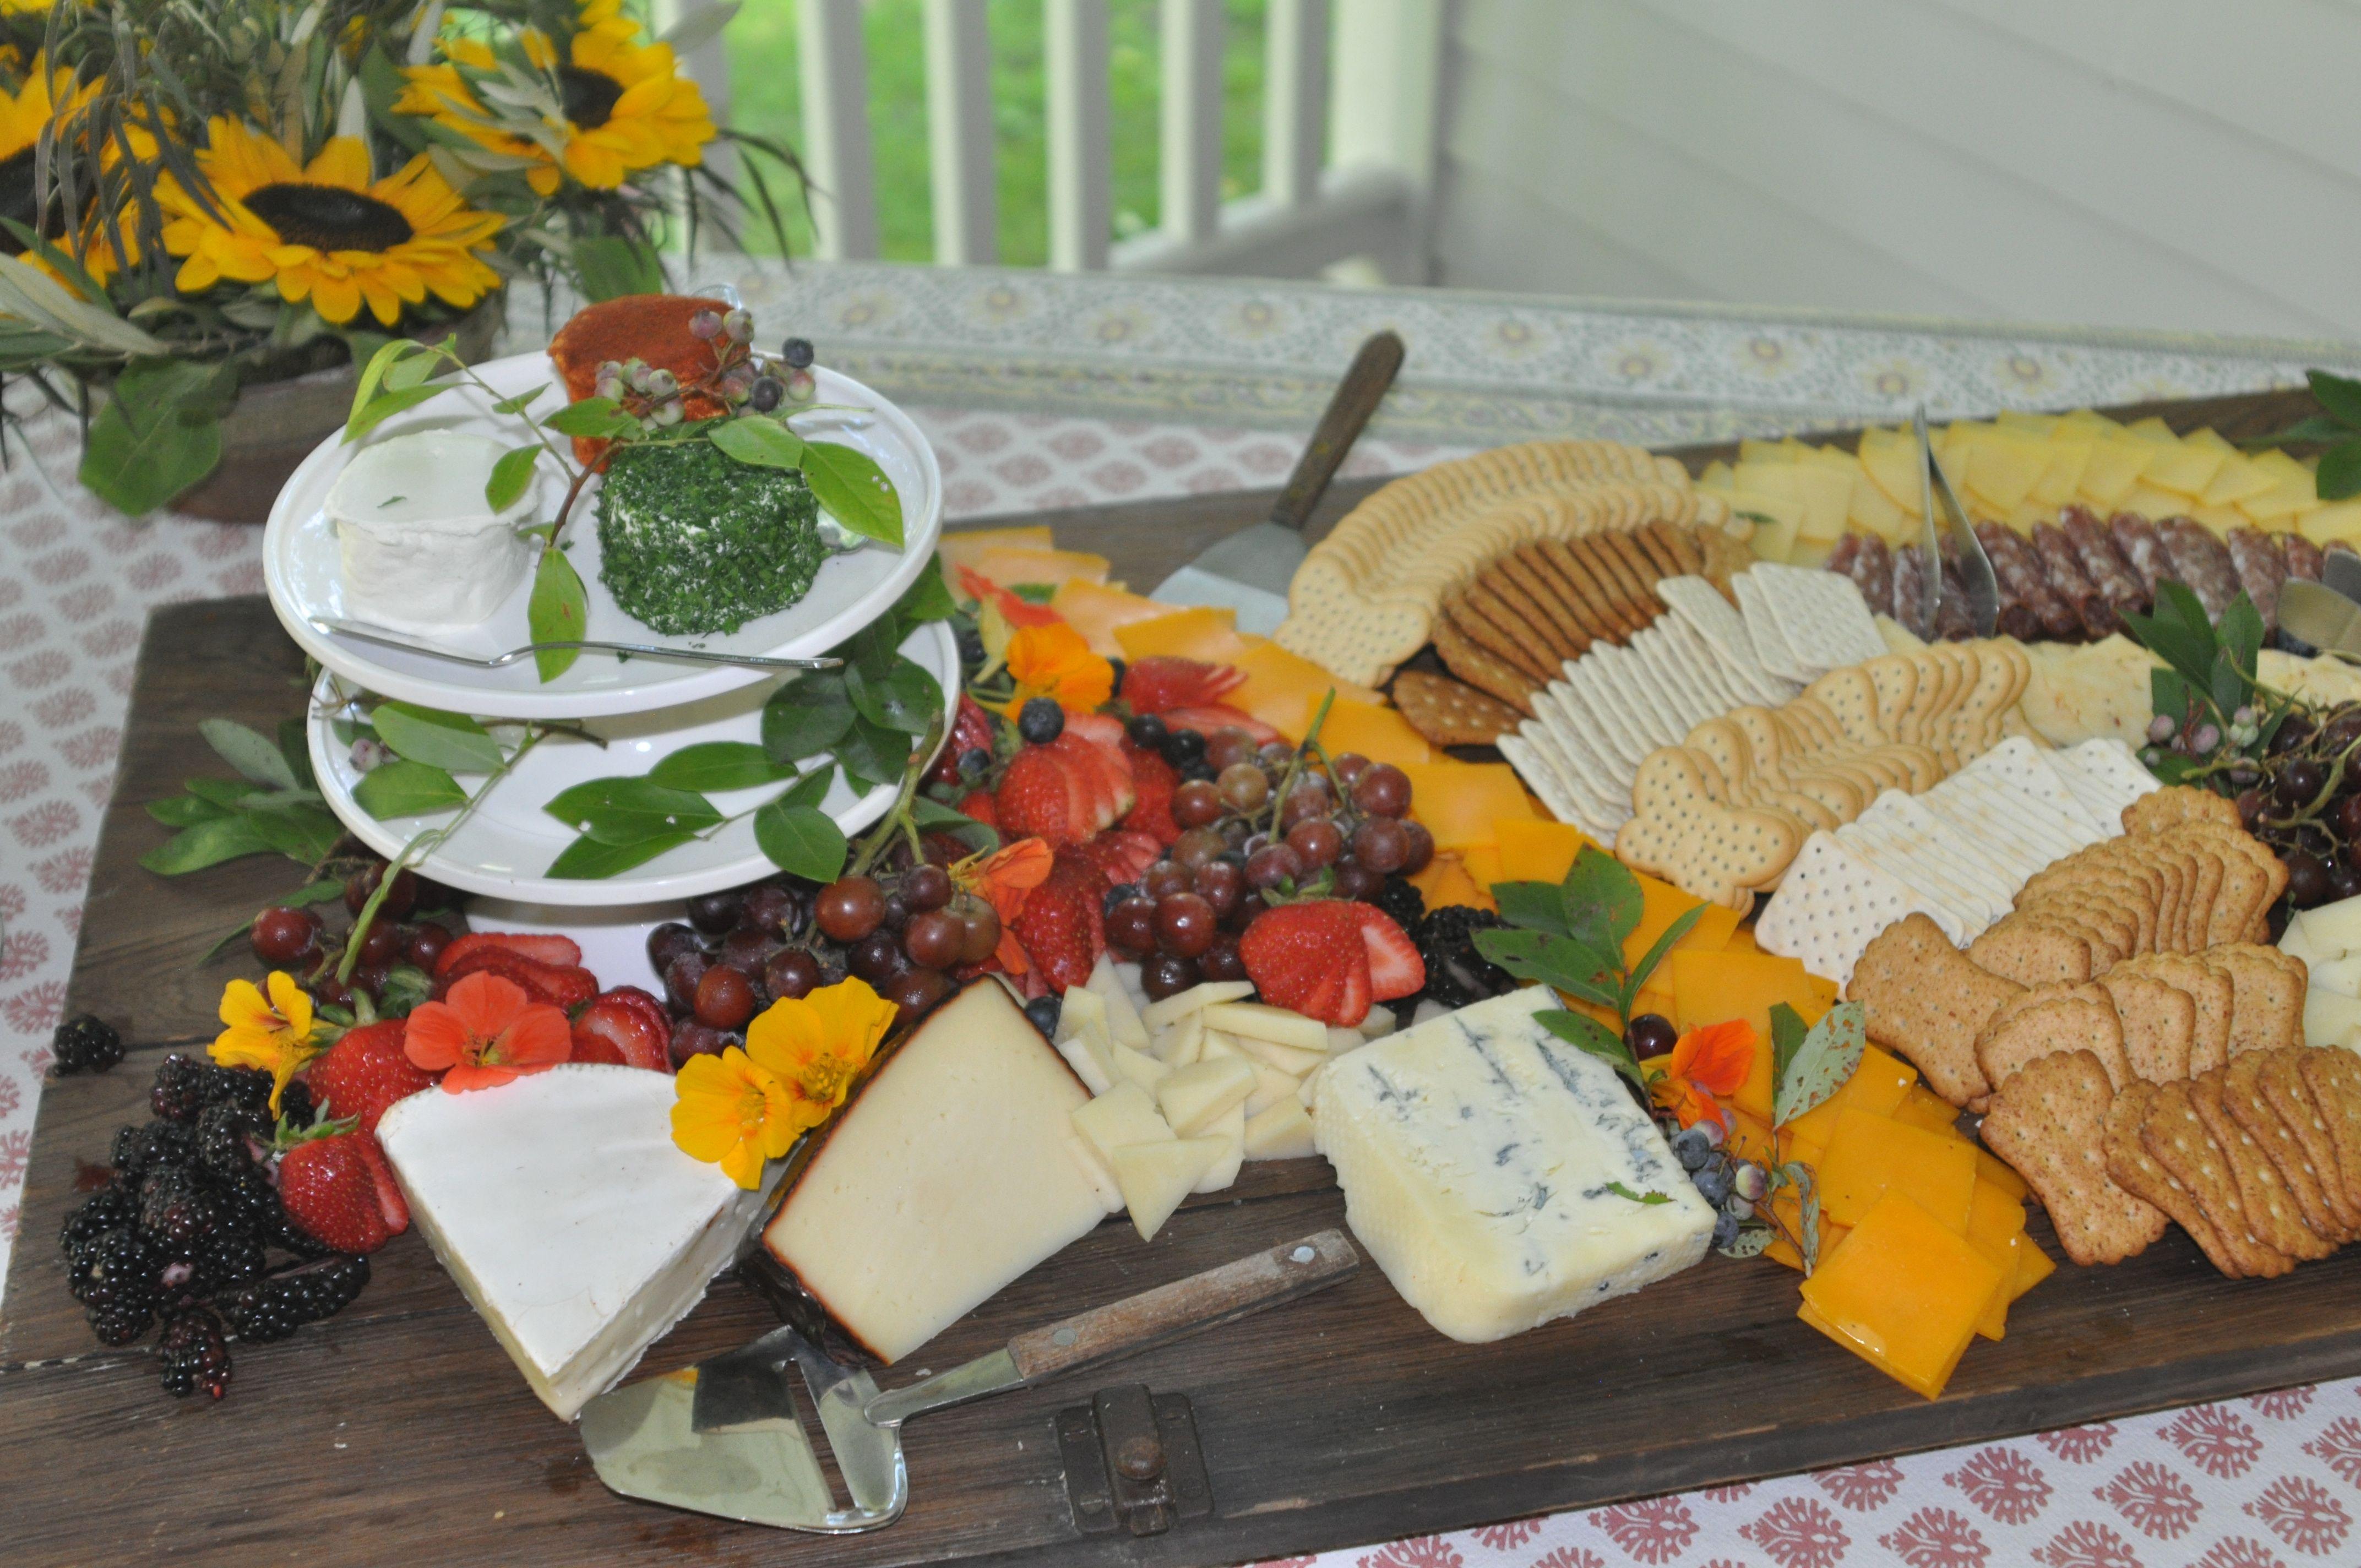 Cheese Platter from the Inn's kitchen Beaverkill Valley